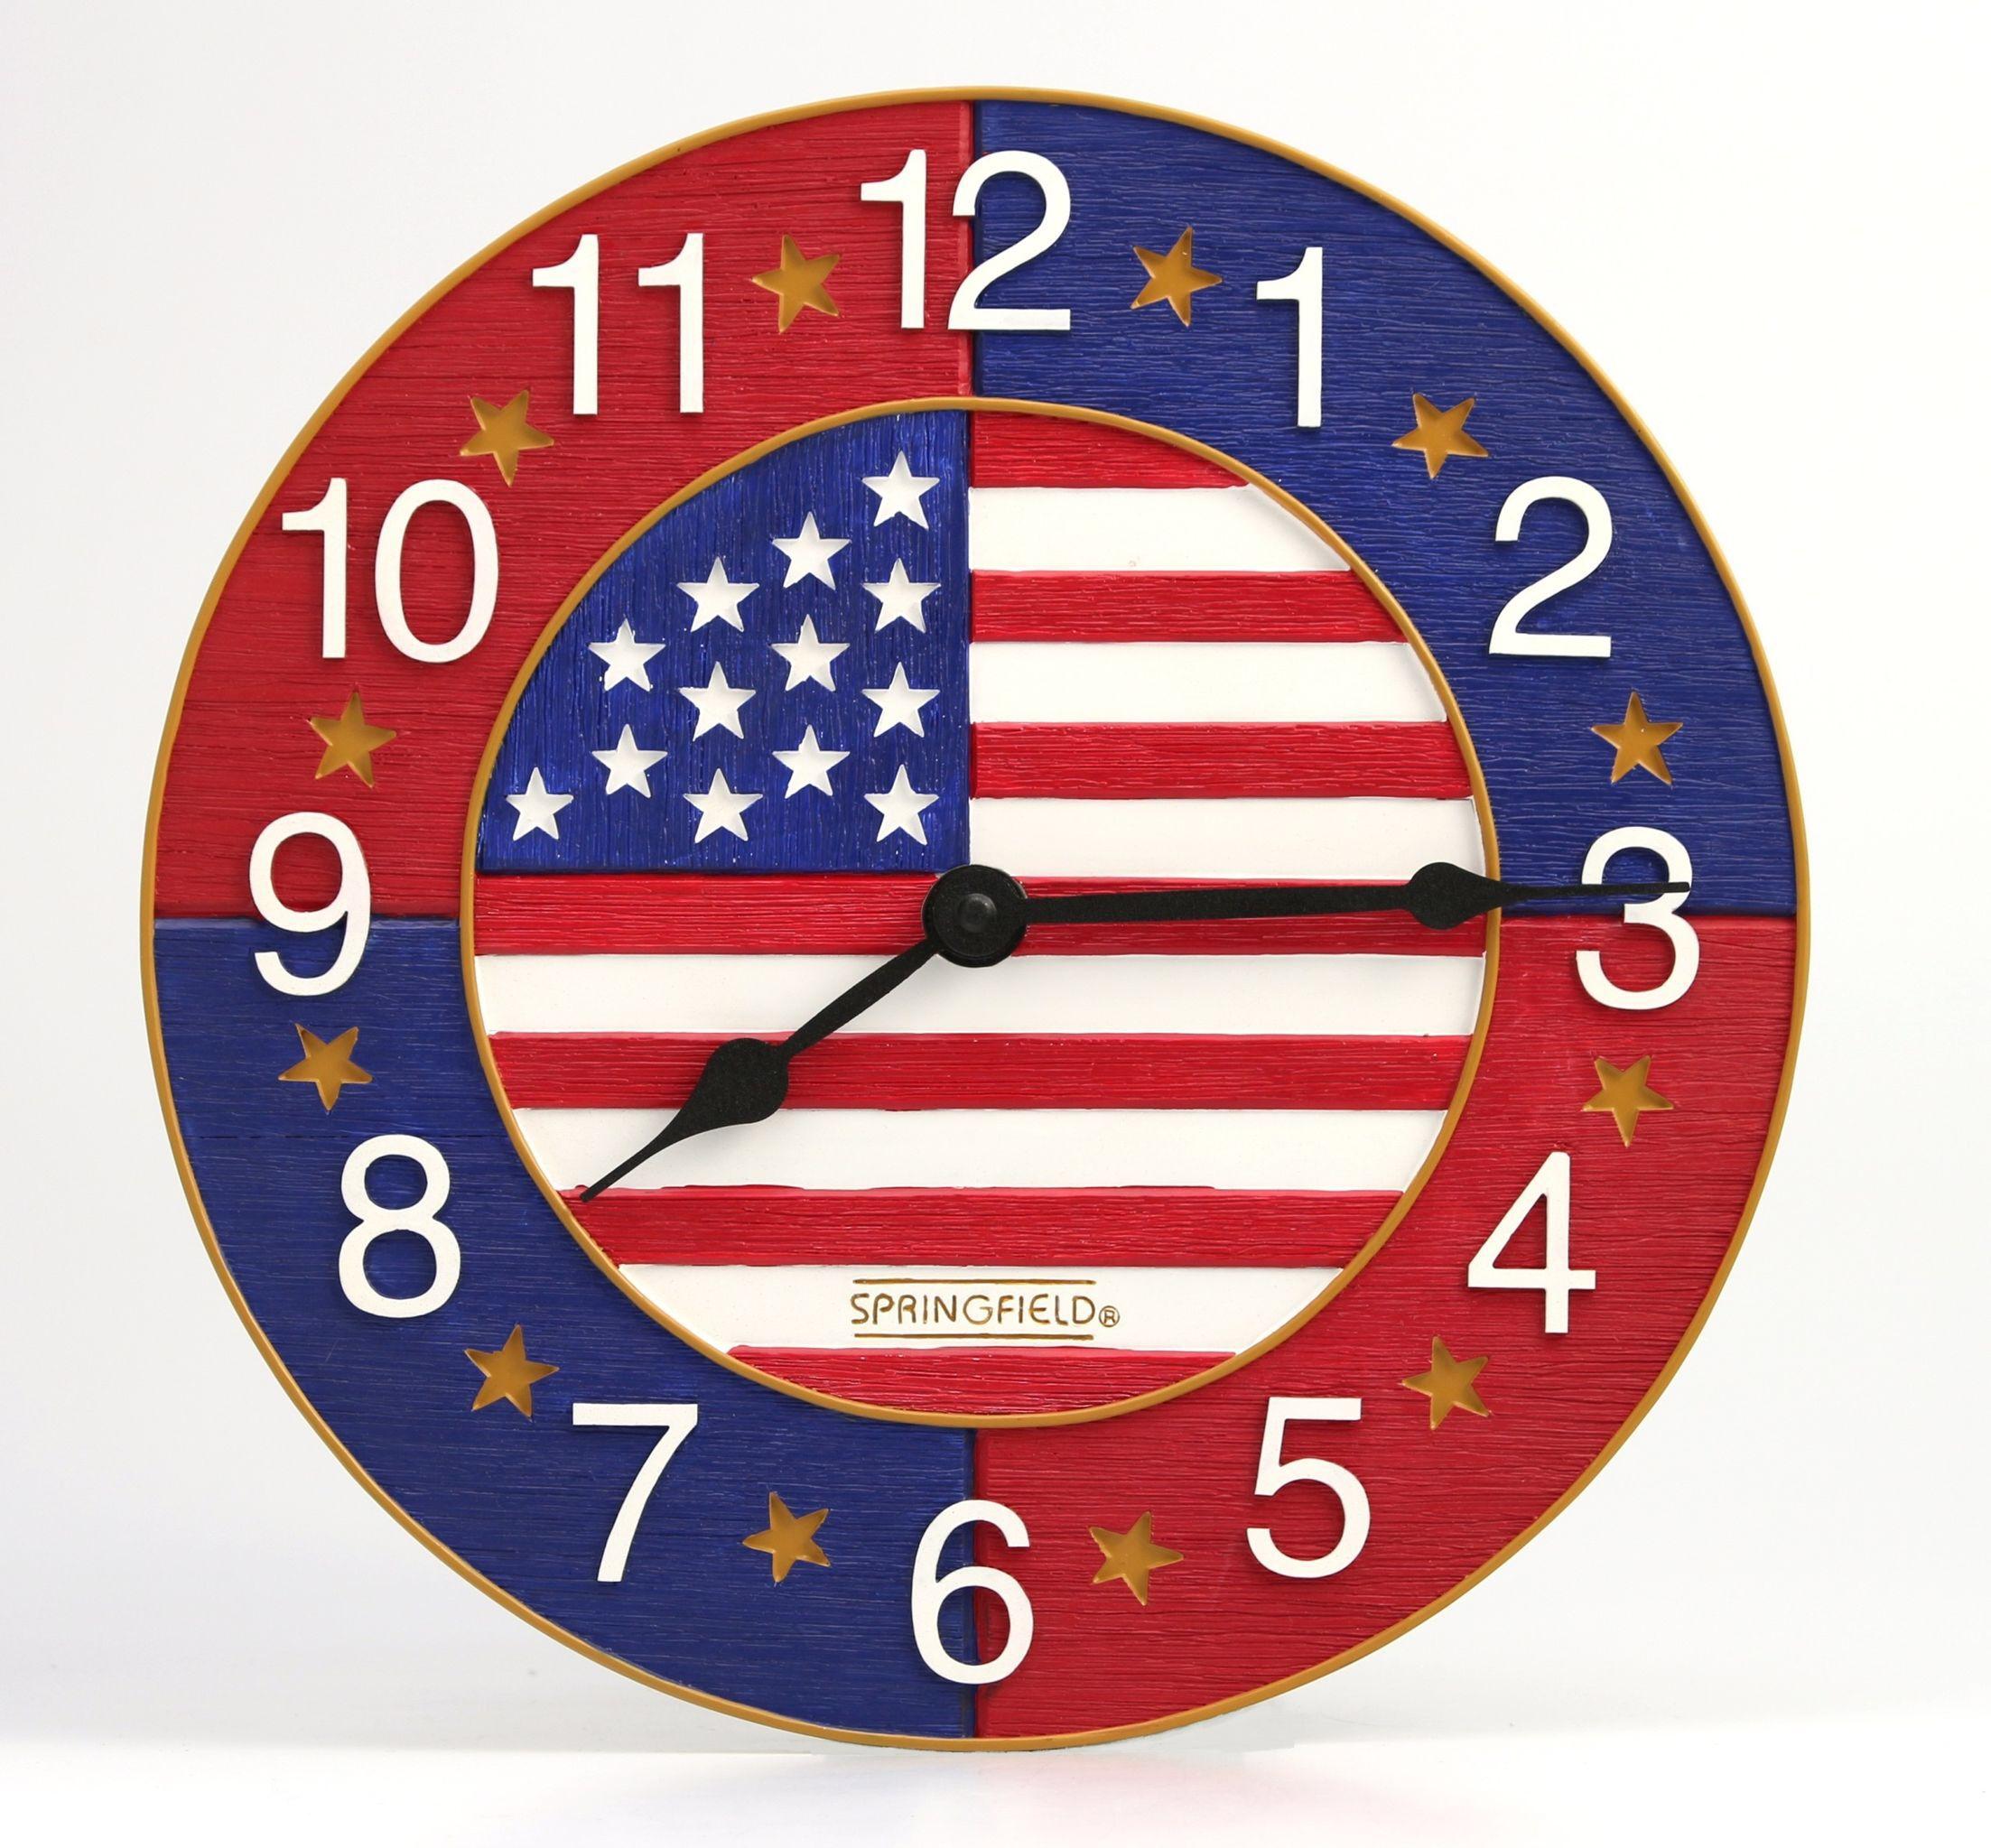 Taylor Springfield 13 American Flag Clock Clock Wall Clock American Flag